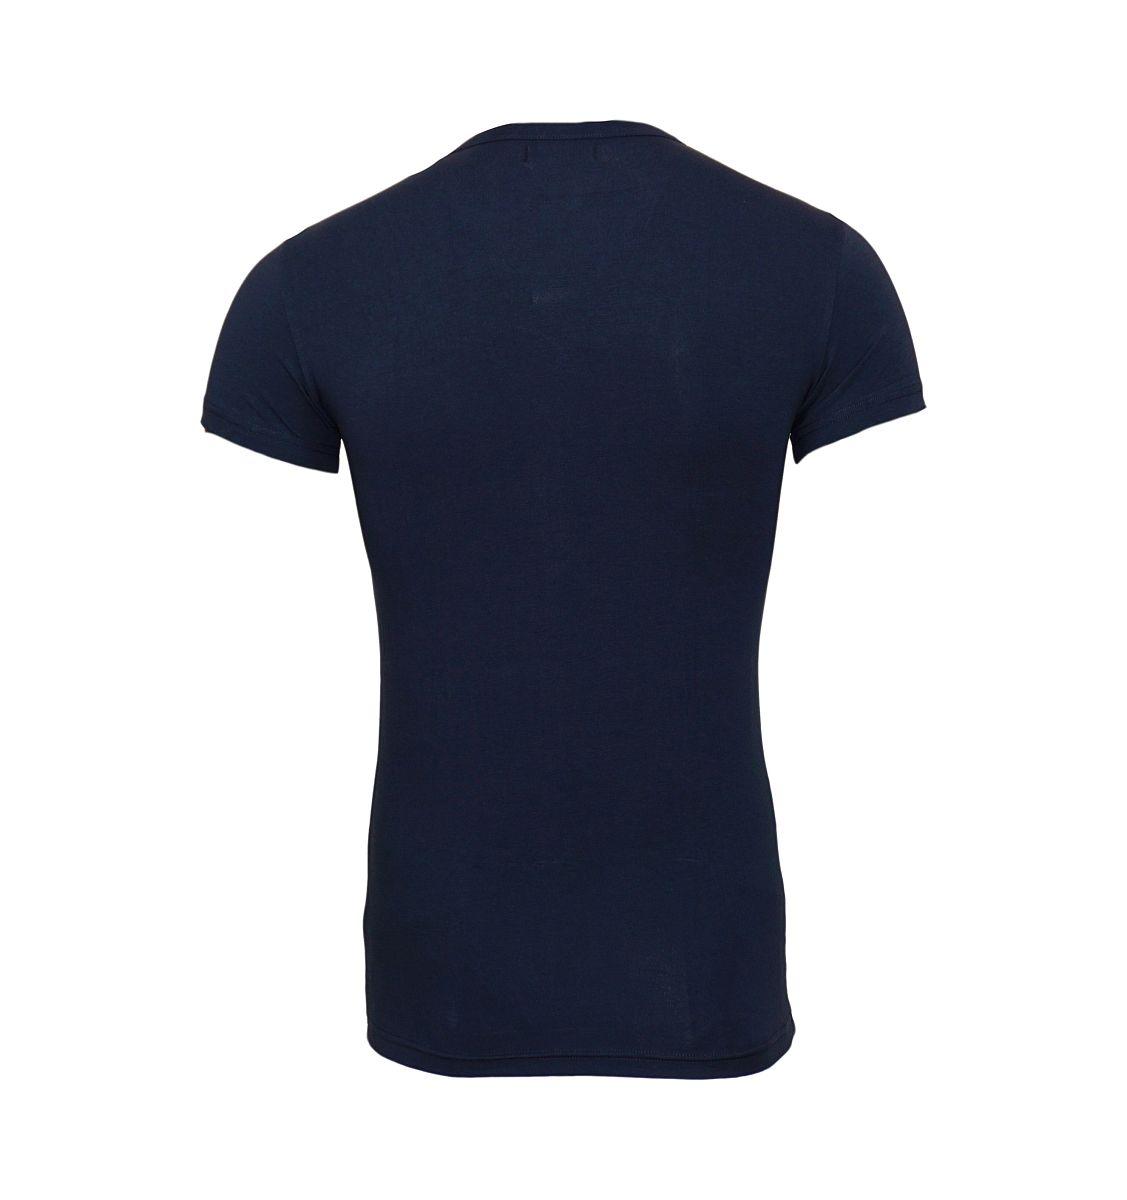 Emporio Armani T-Shirt Shirt Rundhals 111035 7P525 00135 MARINE HW17-ART